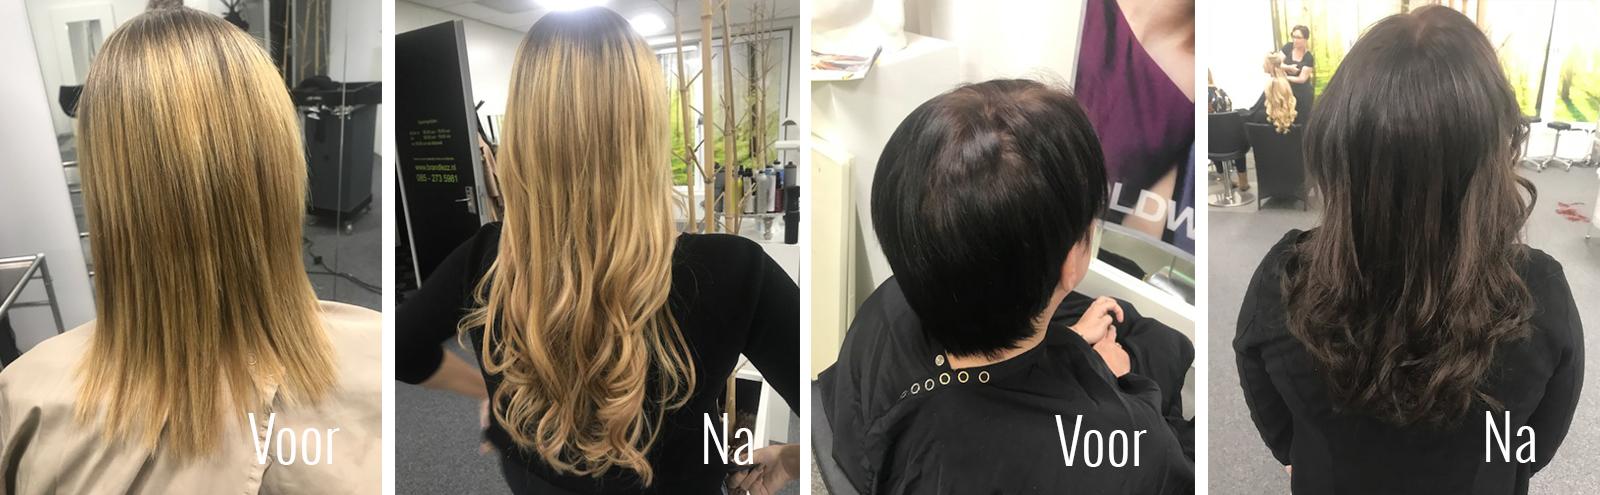 Onwijs Brandlezz | Hairextensions specialist IH-18